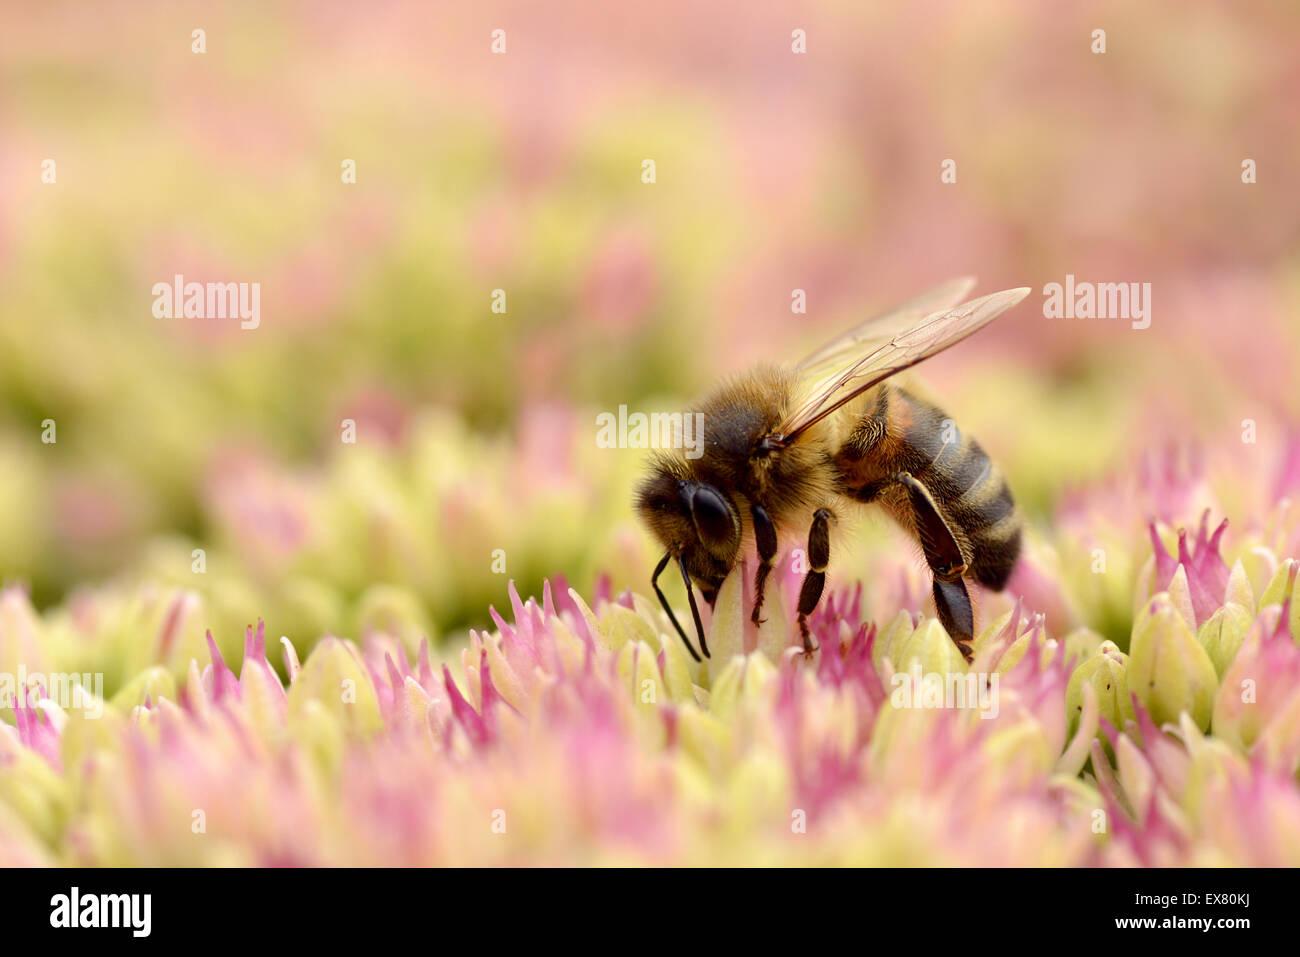 Honey bee feeding on sedum flower - Stock Image